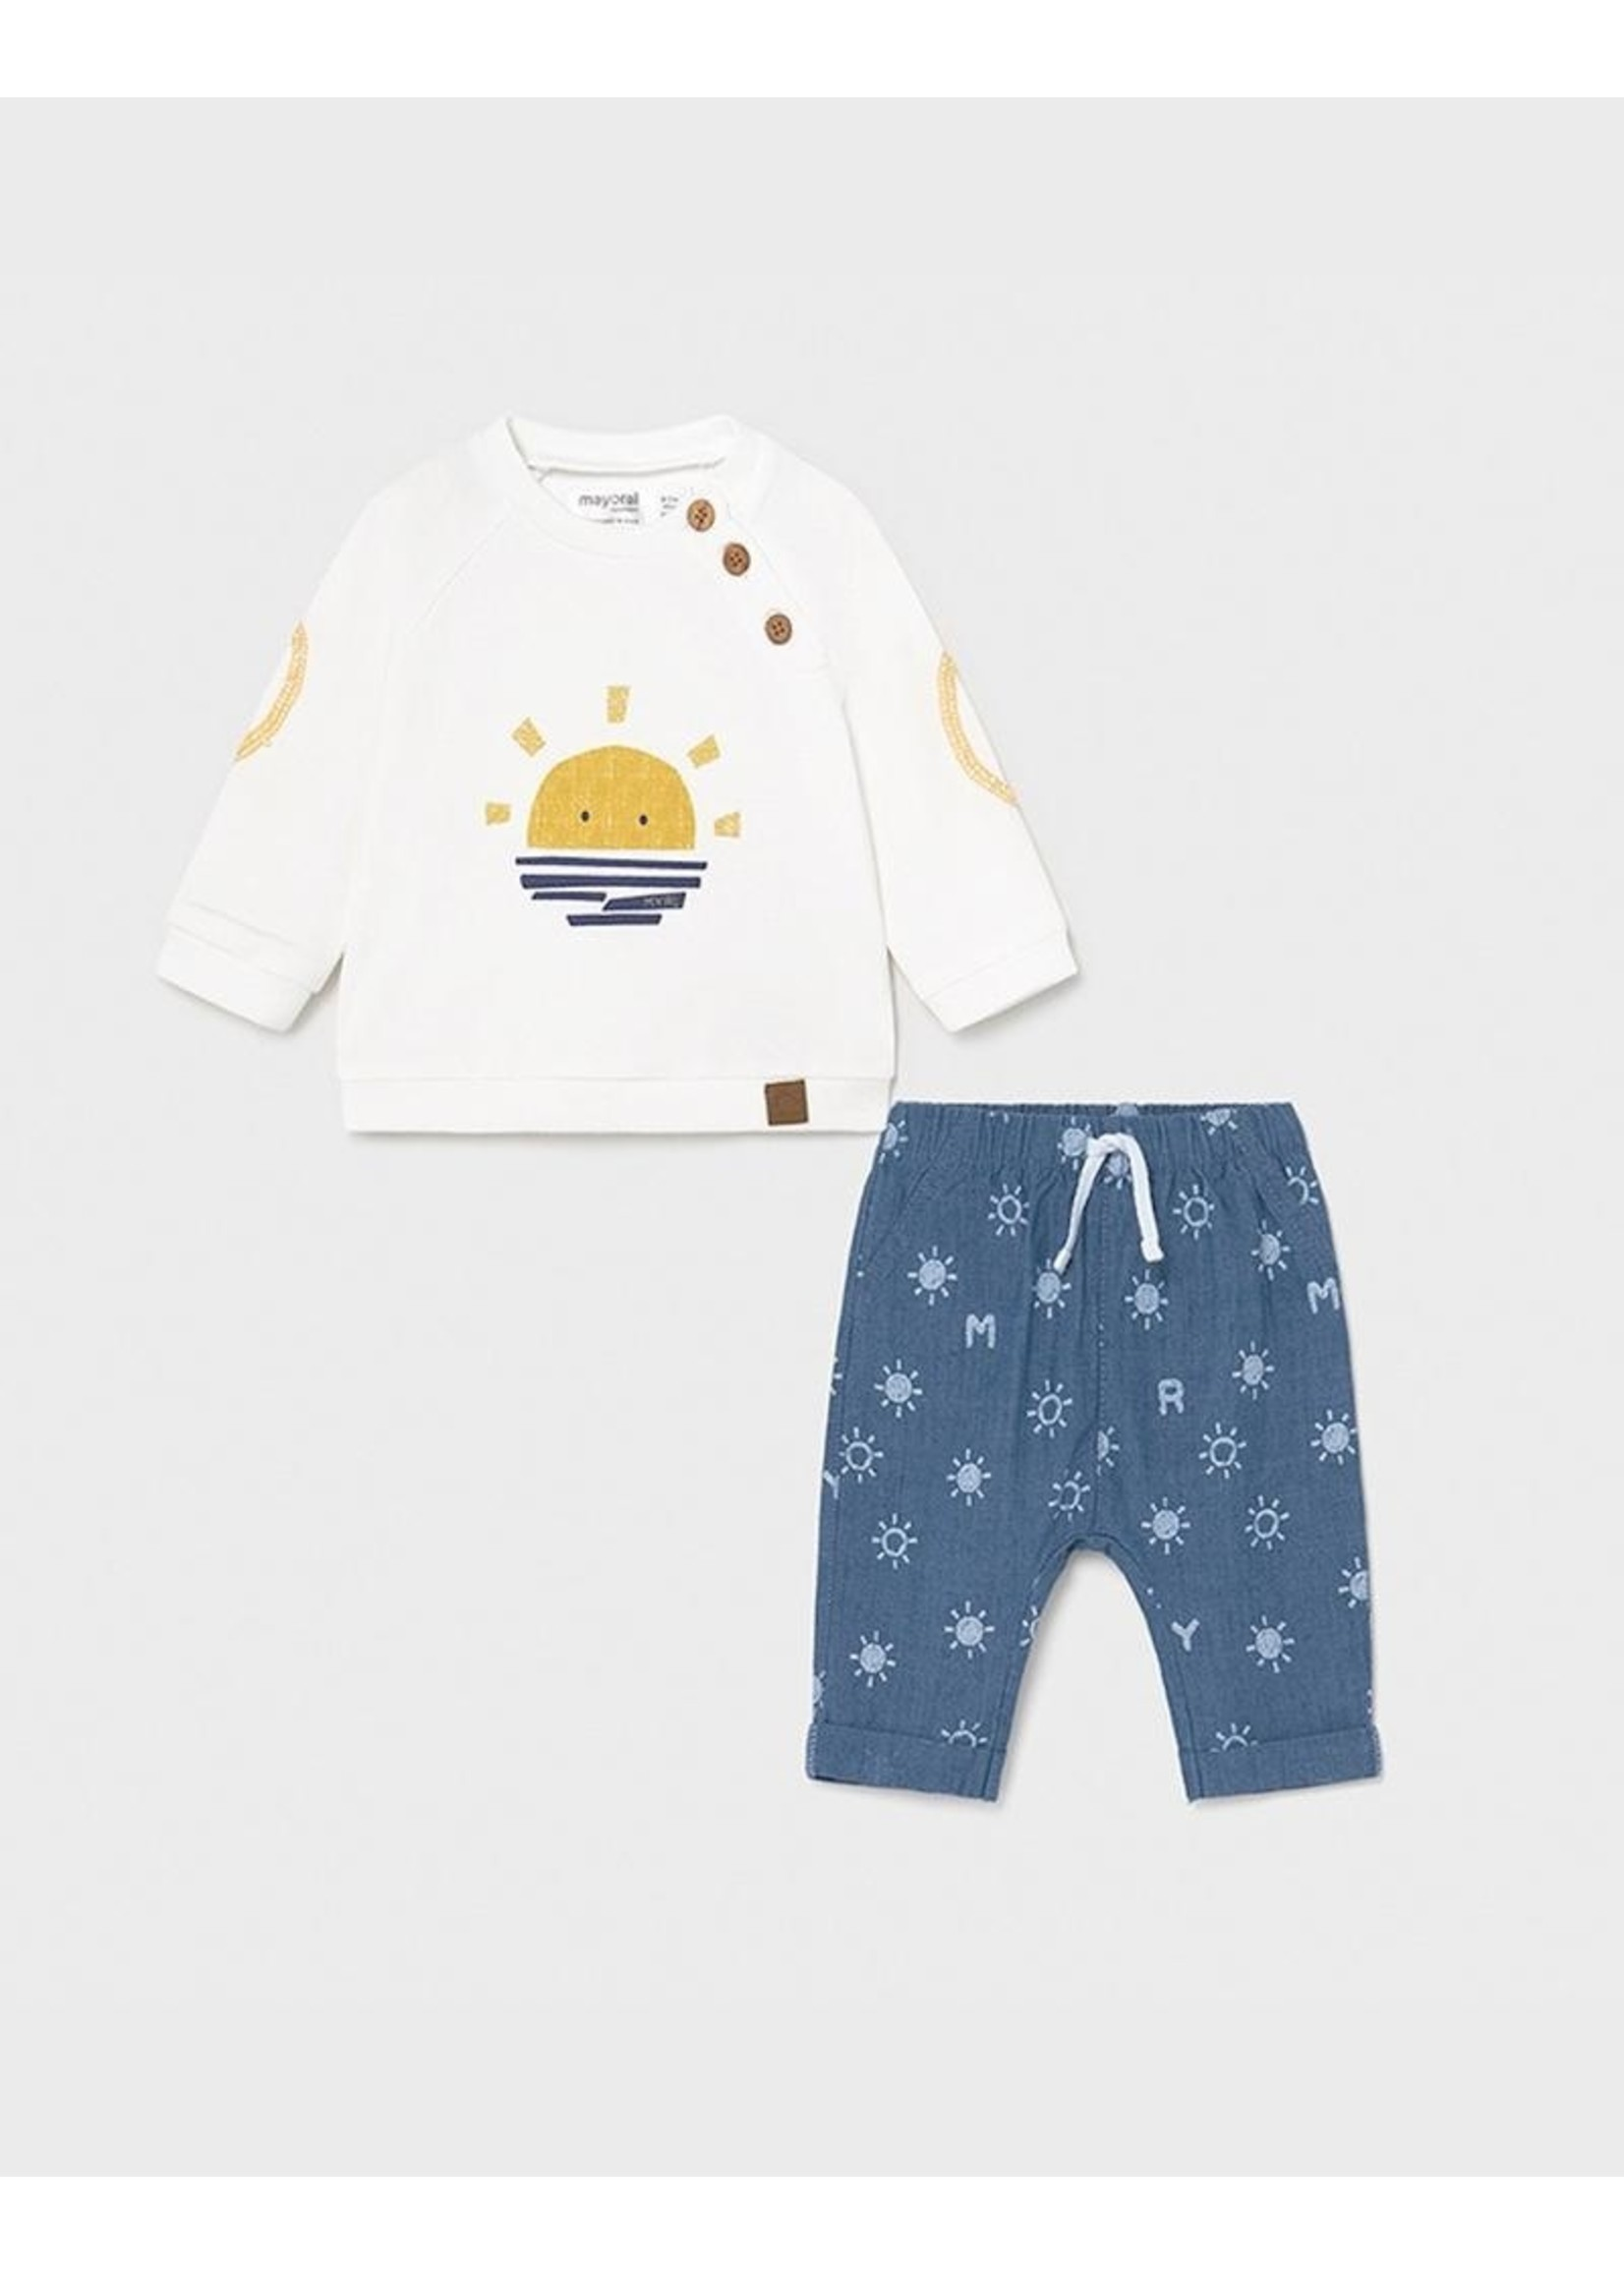 Mayoral Mayoral, Blue Denim Baby Shirt and Pant Set